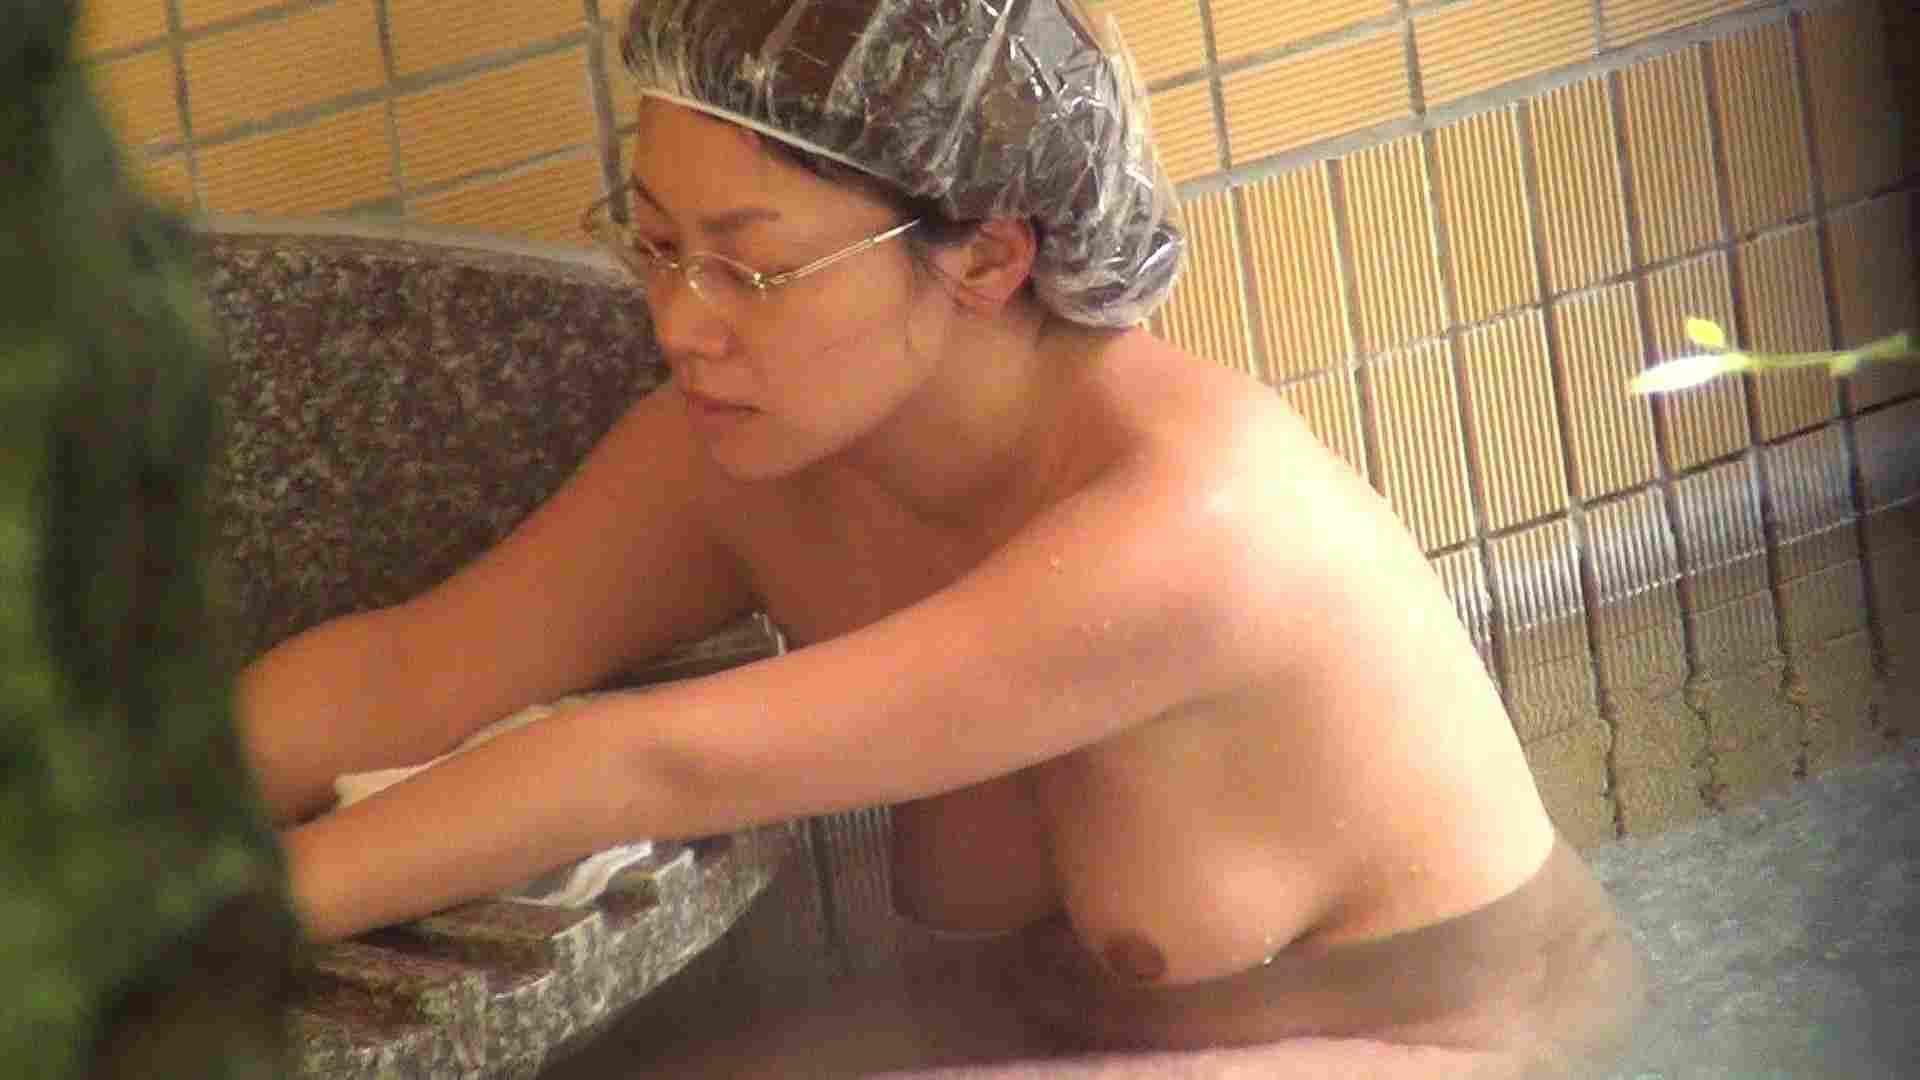 Aquaな露天風呂Vol.280 露天 戯れ無修正画像 91画像 17